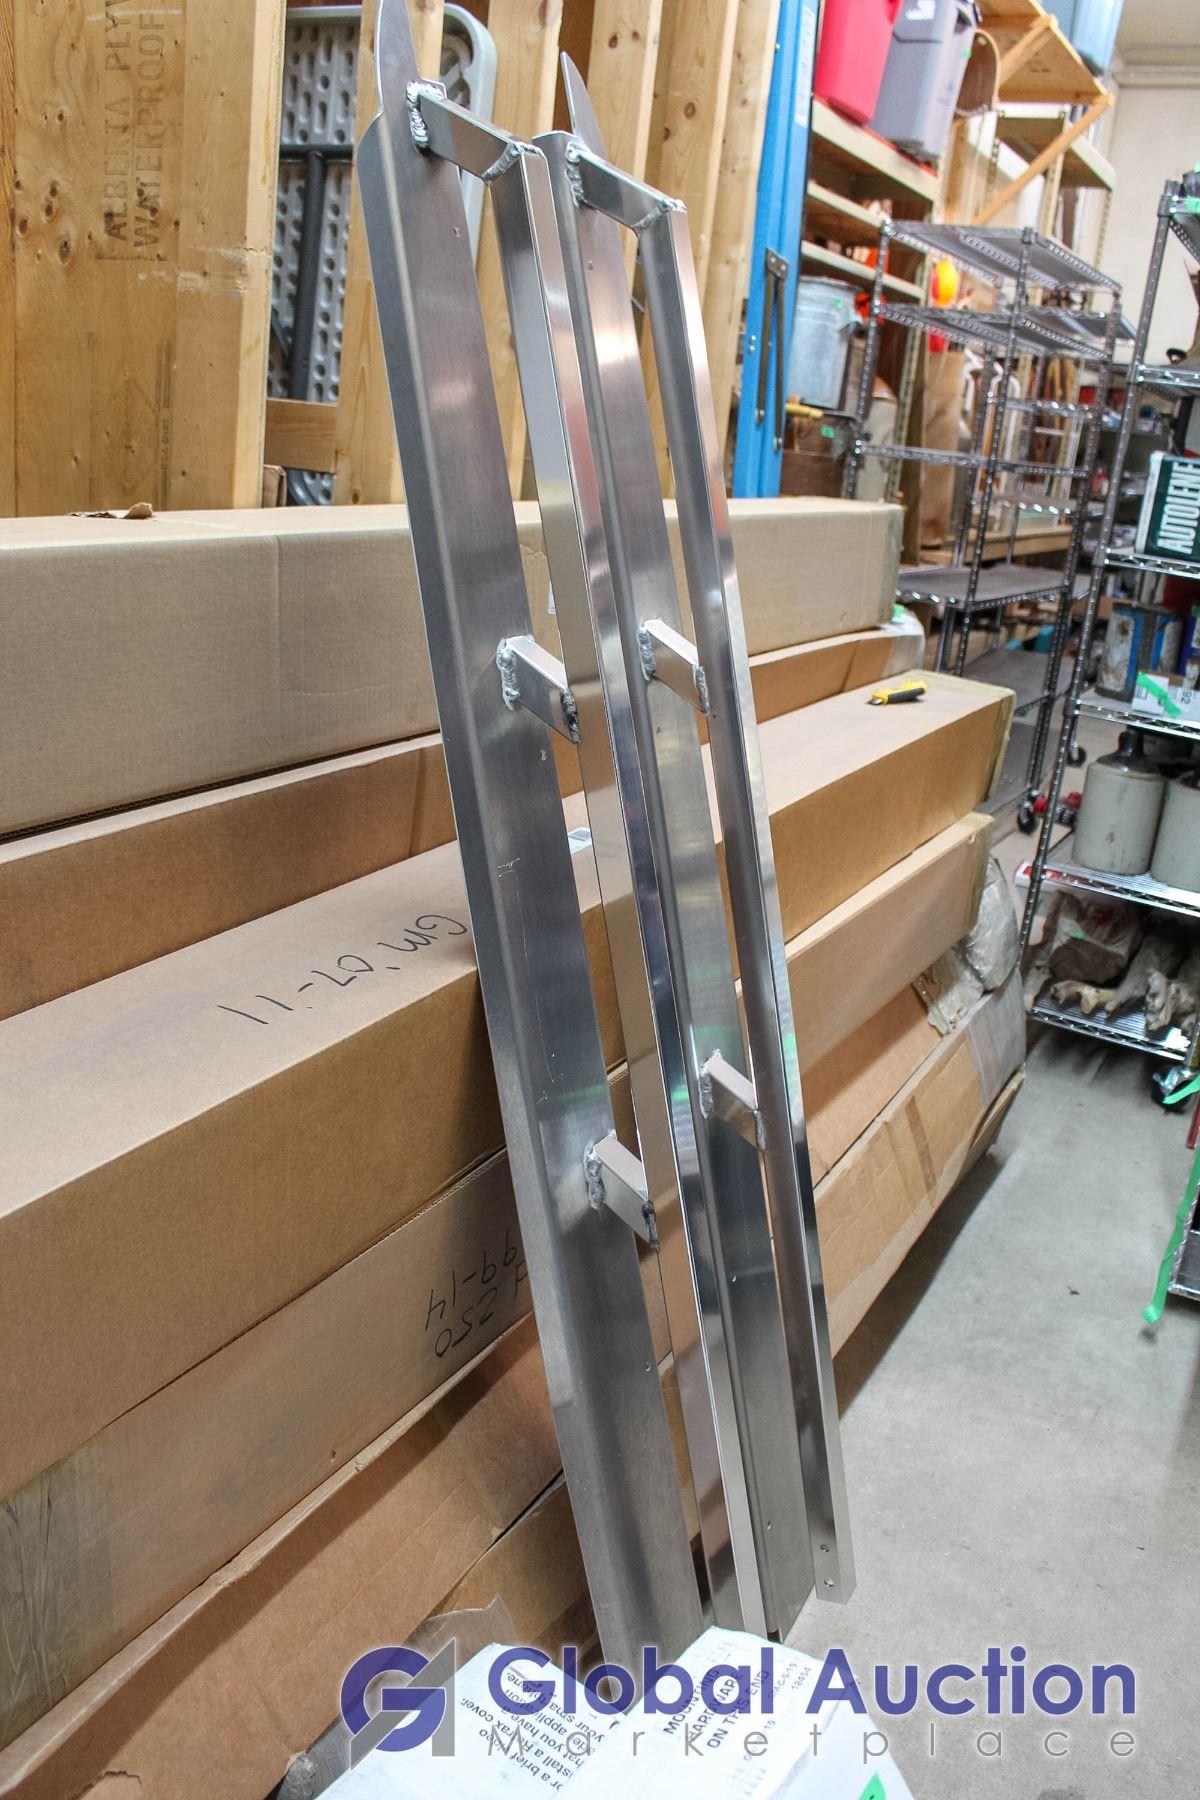 Ford F-150 09-14 5 5' Box Aluminum Rails  Part # ASR-534, Advance  Manufacturing, S&D